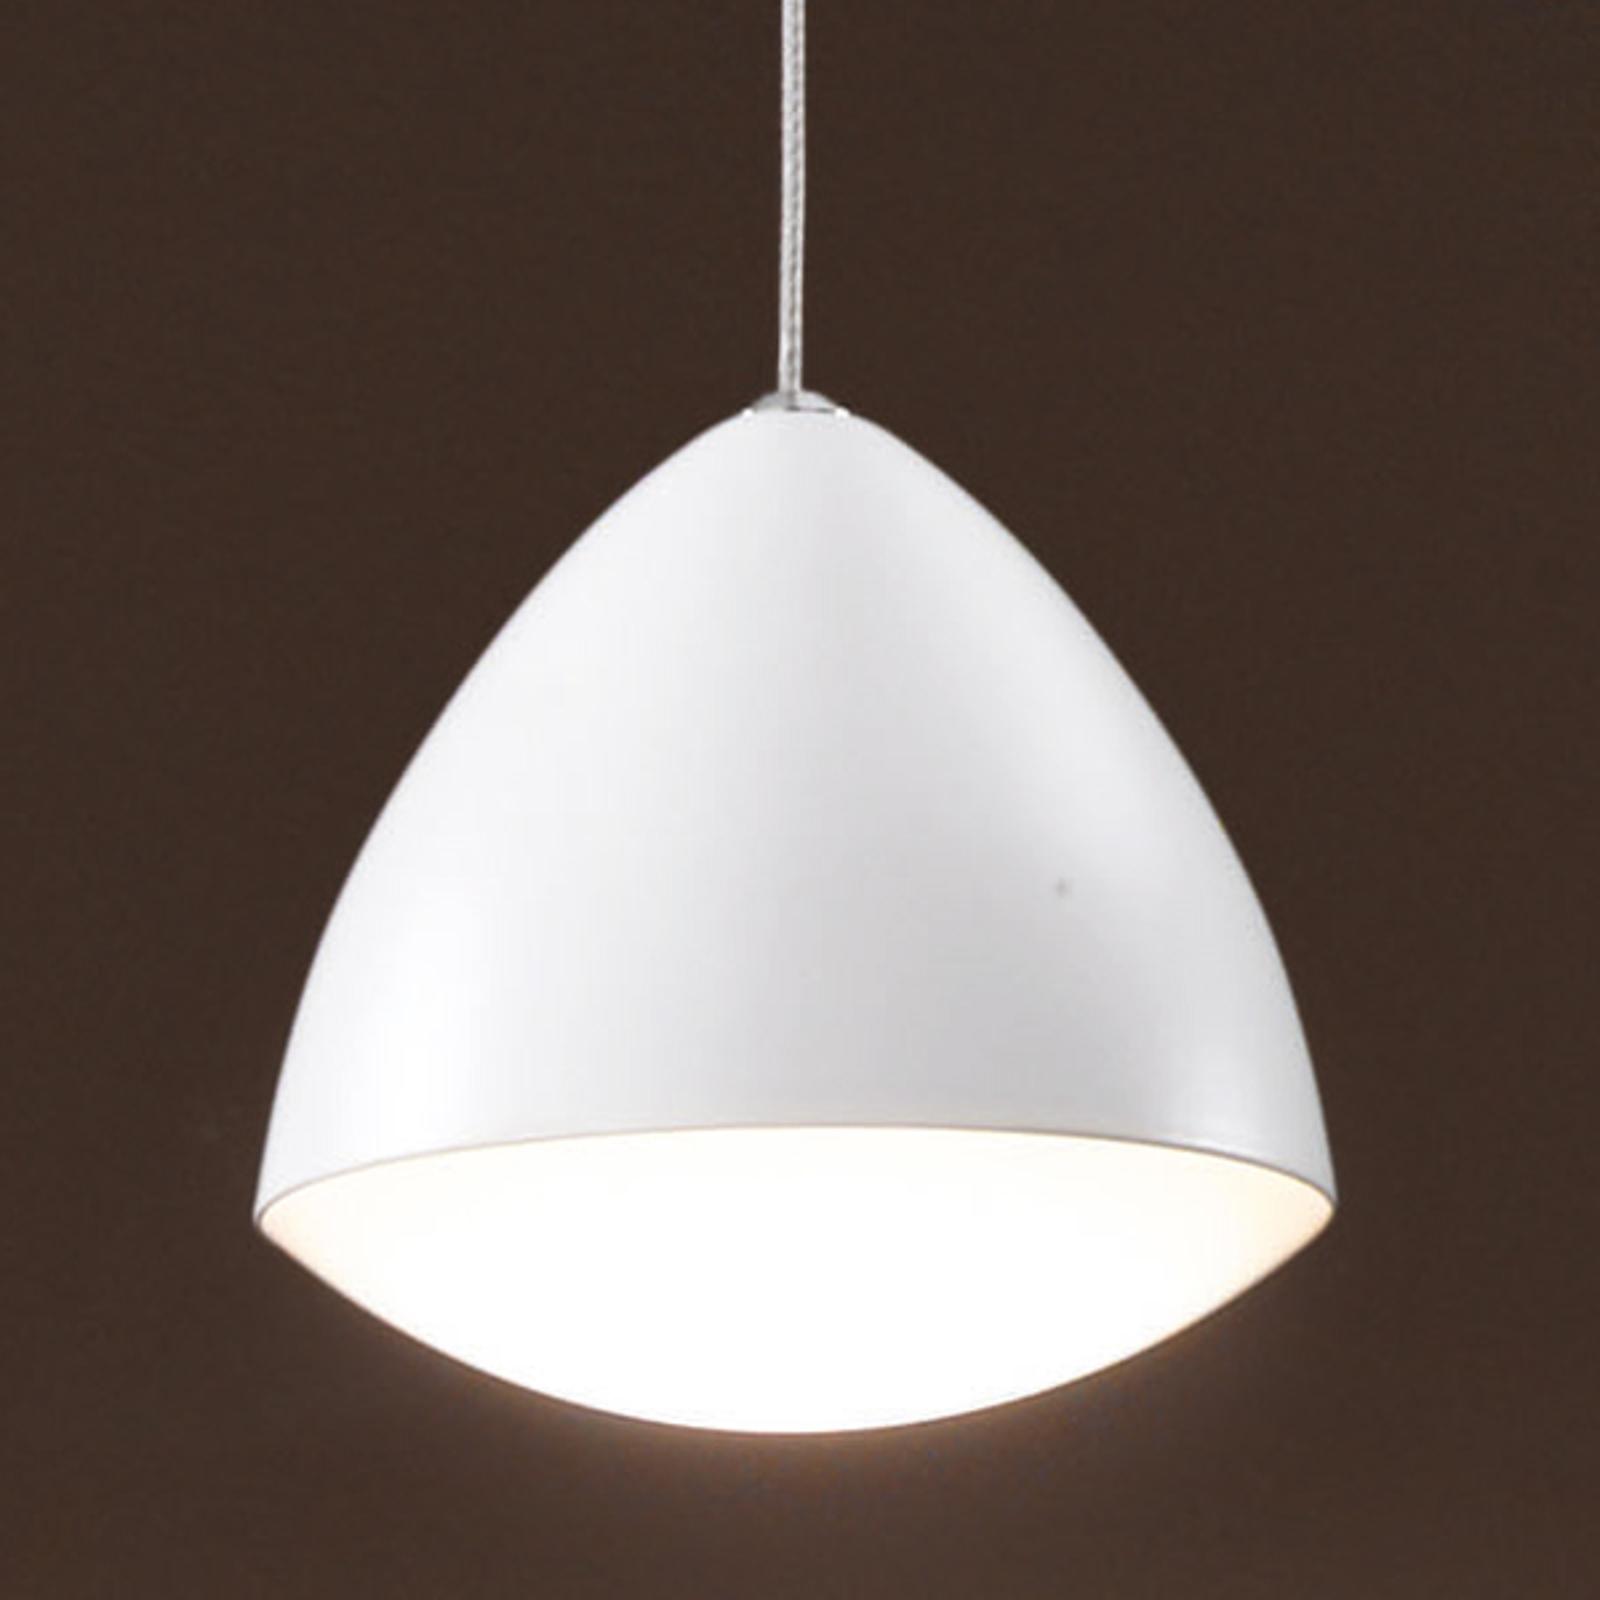 Bike - LED hanglamp met één lampje, dimbaar